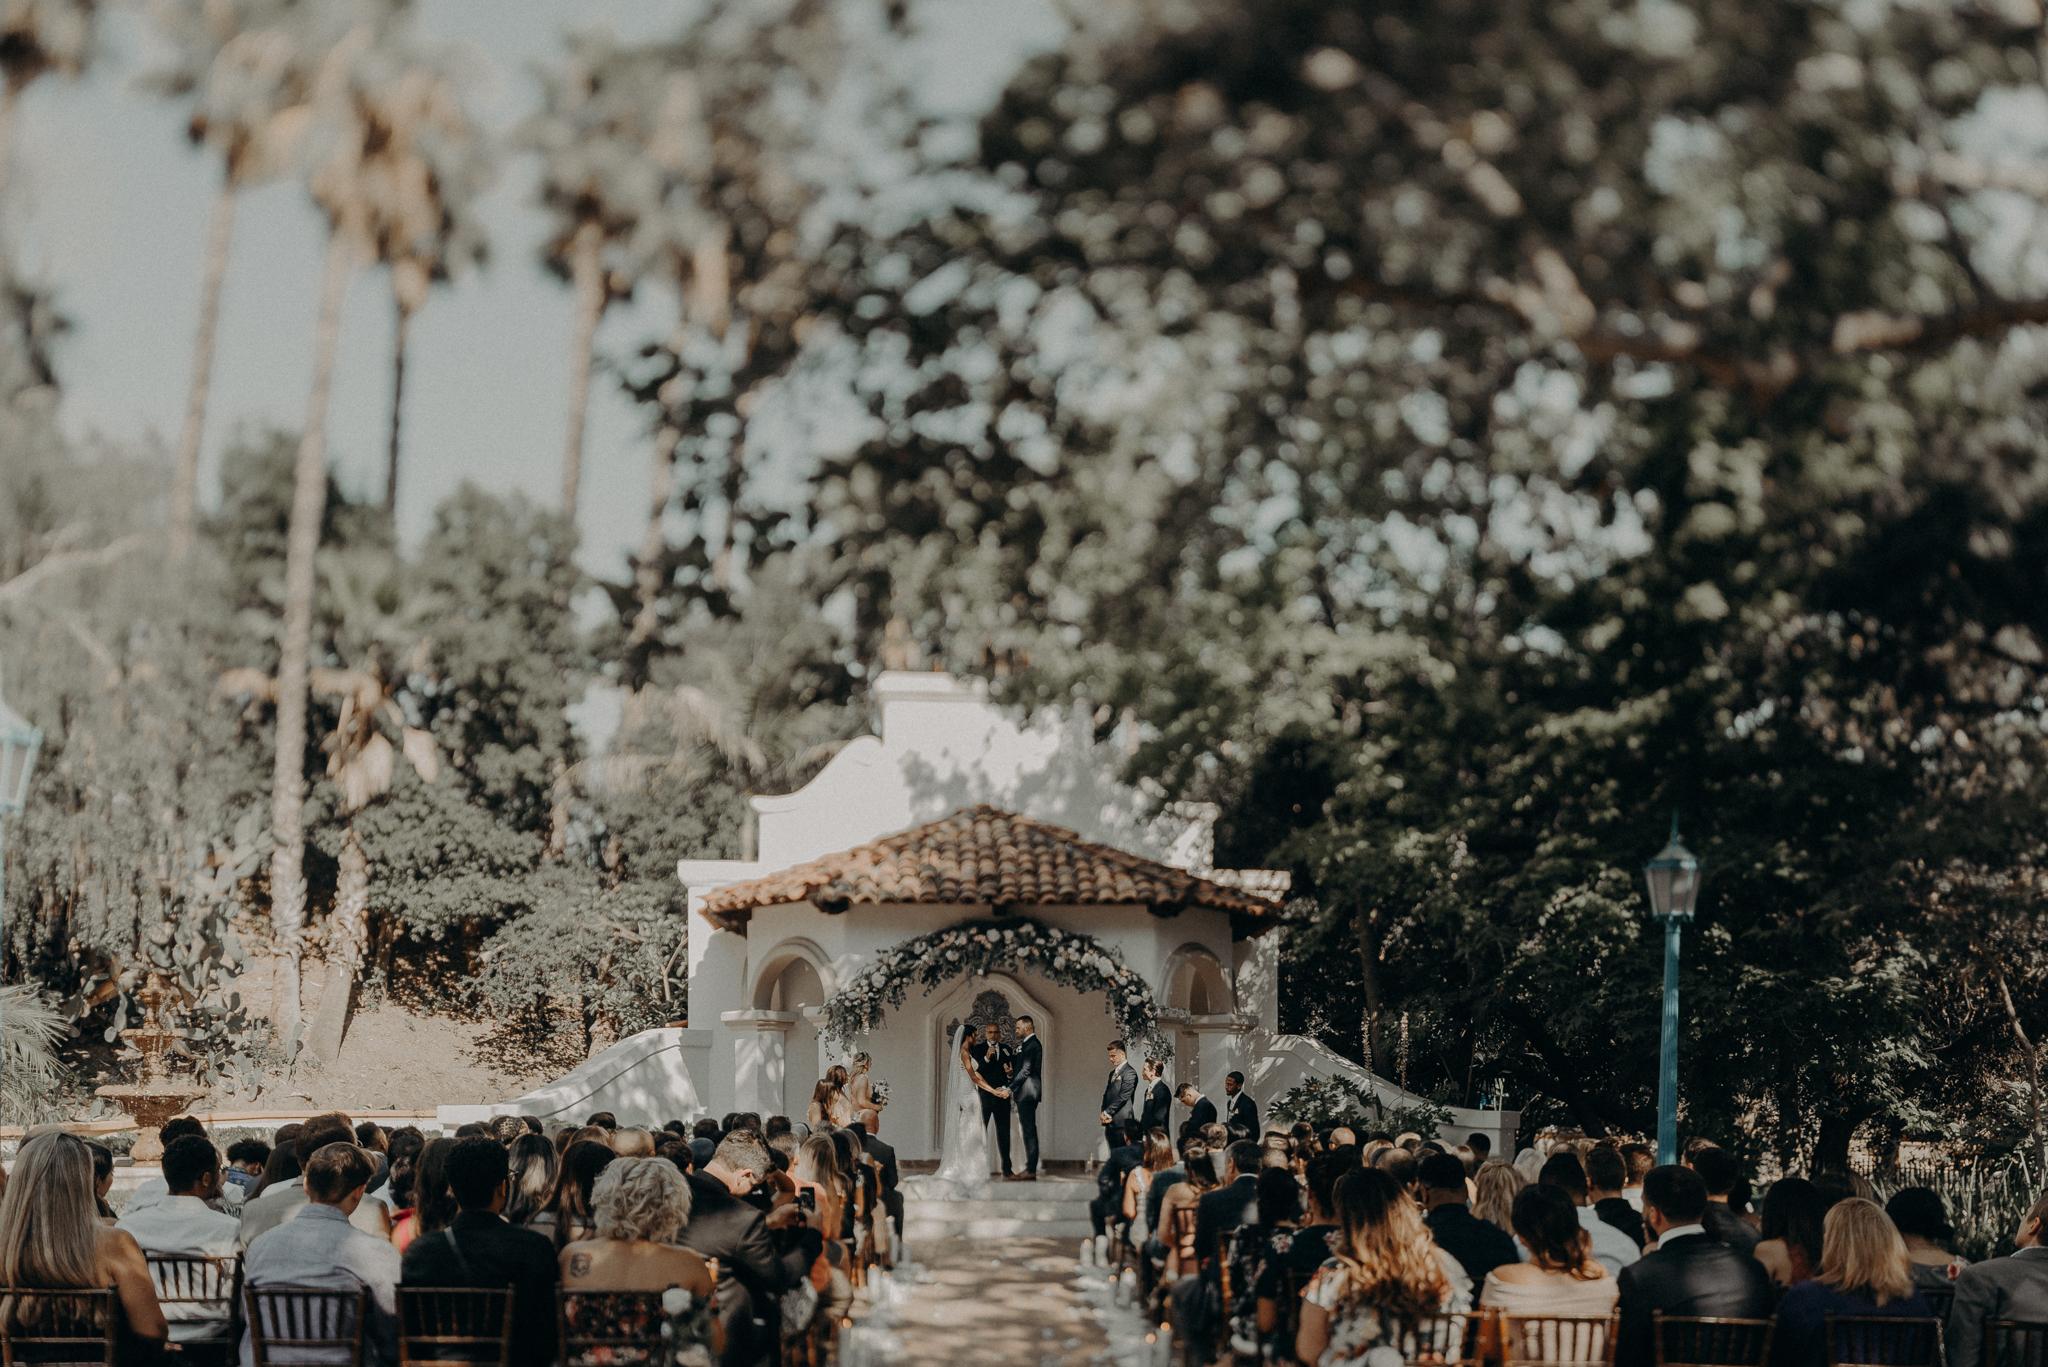 Isaiah + Taylor Photography - Rancho Las Lomas Wedding, Los Angeles Wedding Photographer-049.jpg